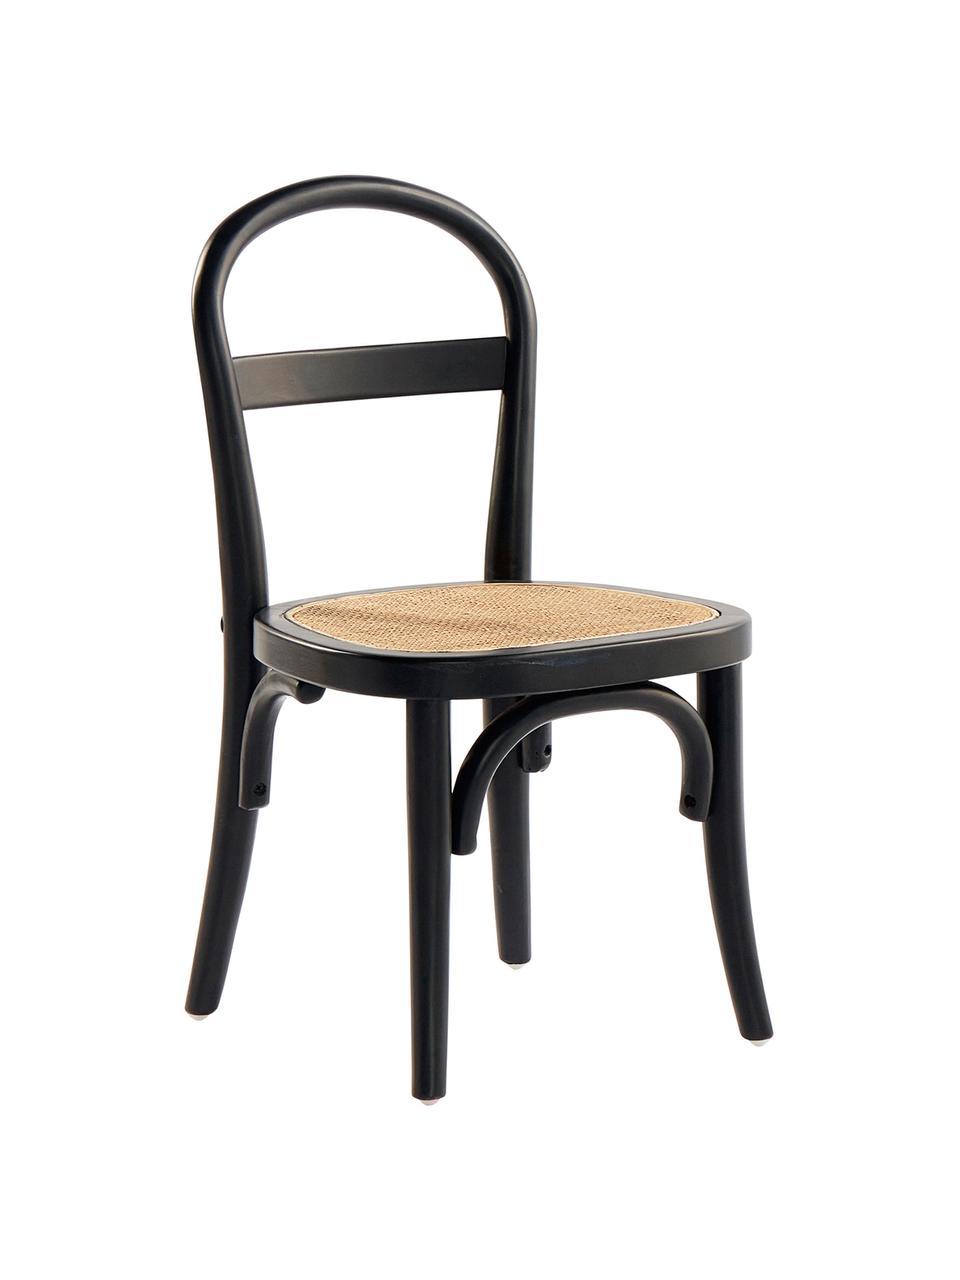 Kinderstühle Rippats, 2 Stück, Birkenholz, Rattan, Schwarz, Rattan, B 33 x T 35 cm